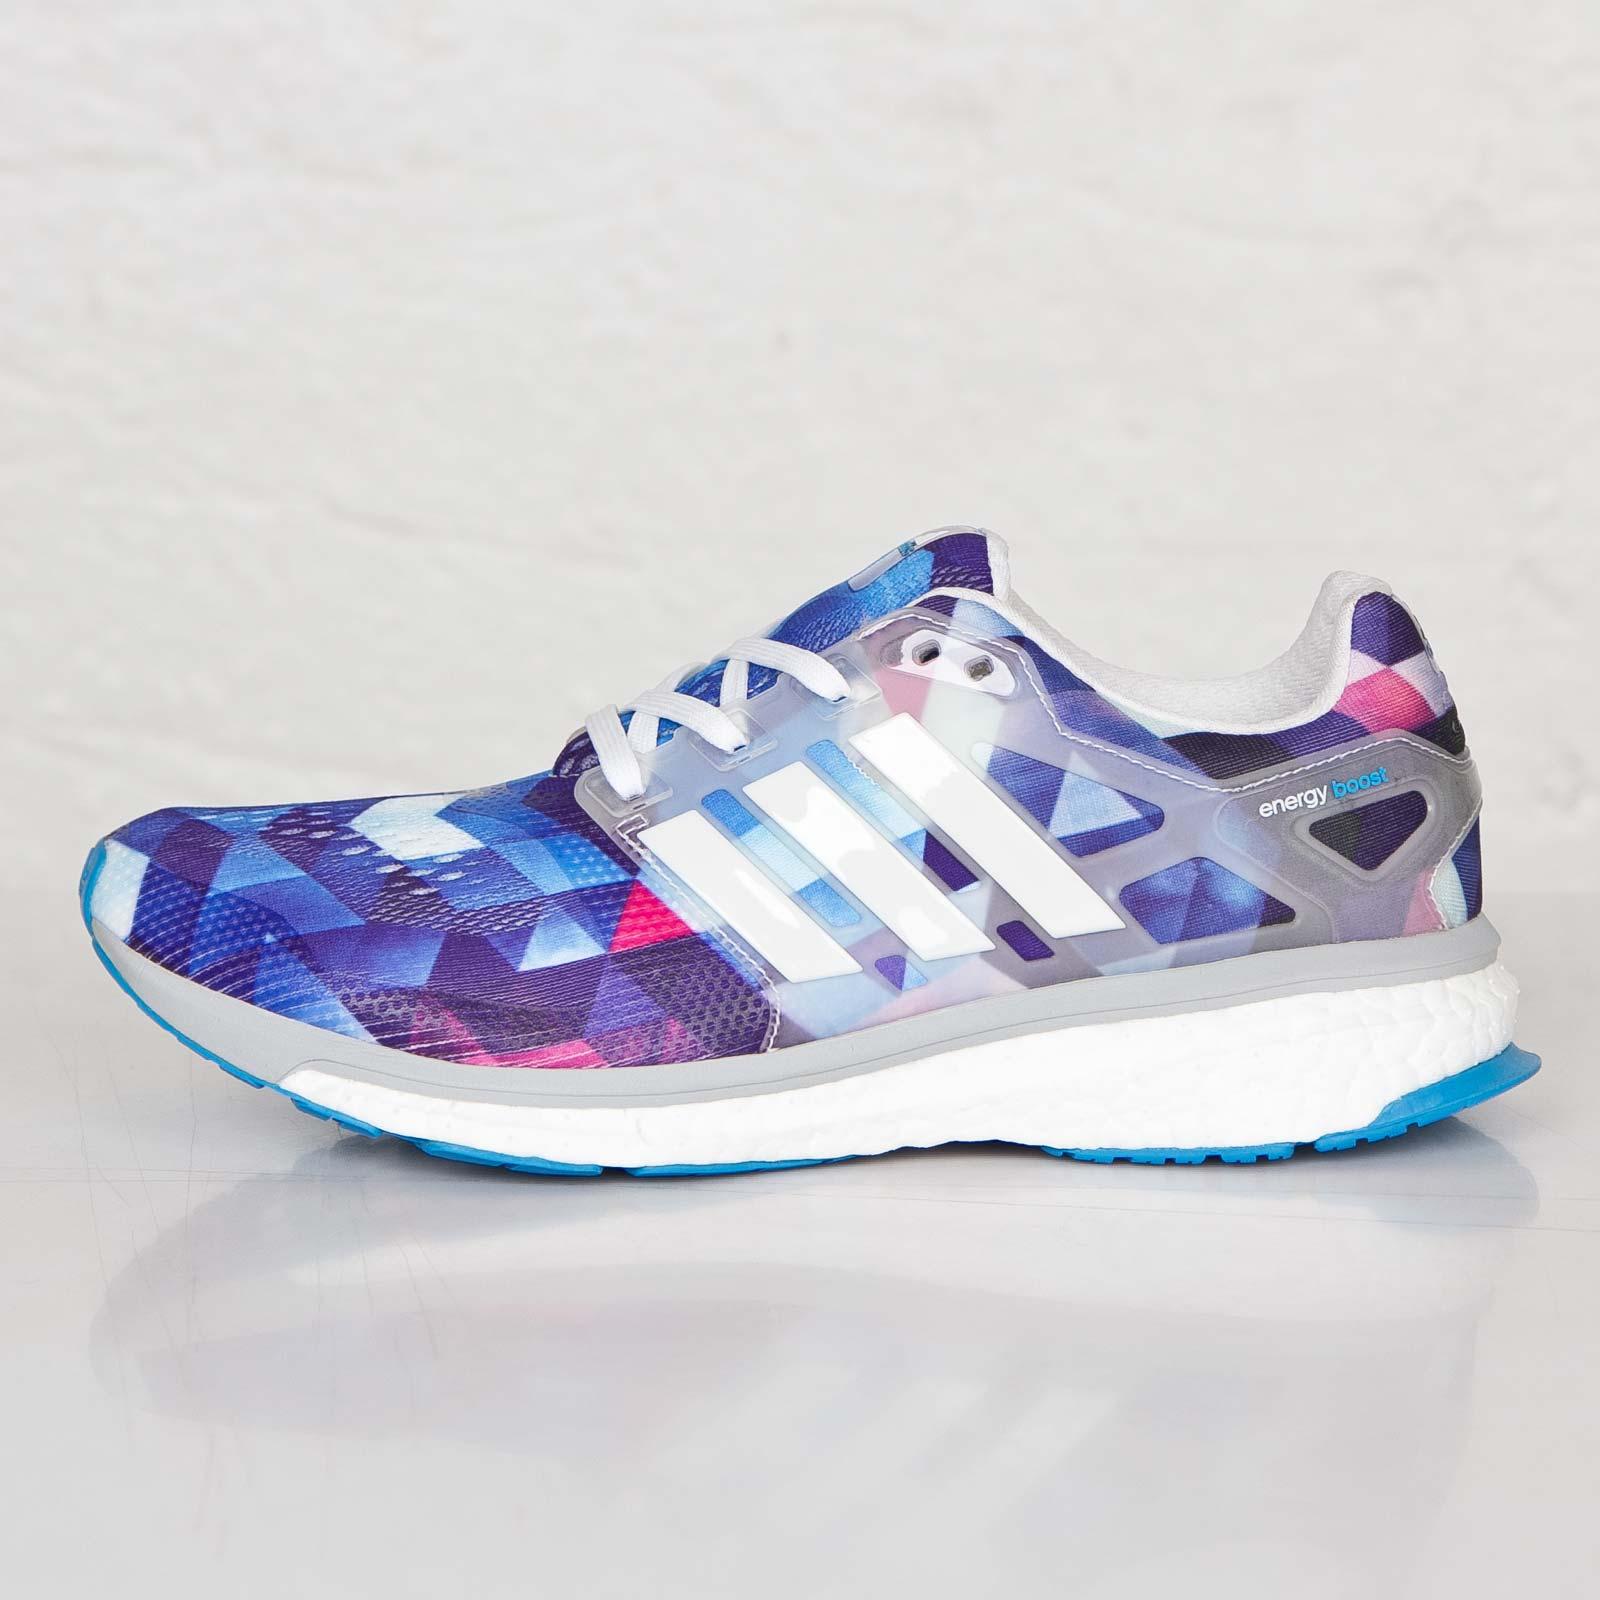 adidas energy boost ESM m - B26593 - Sneakersnstuff  6c1a581d5